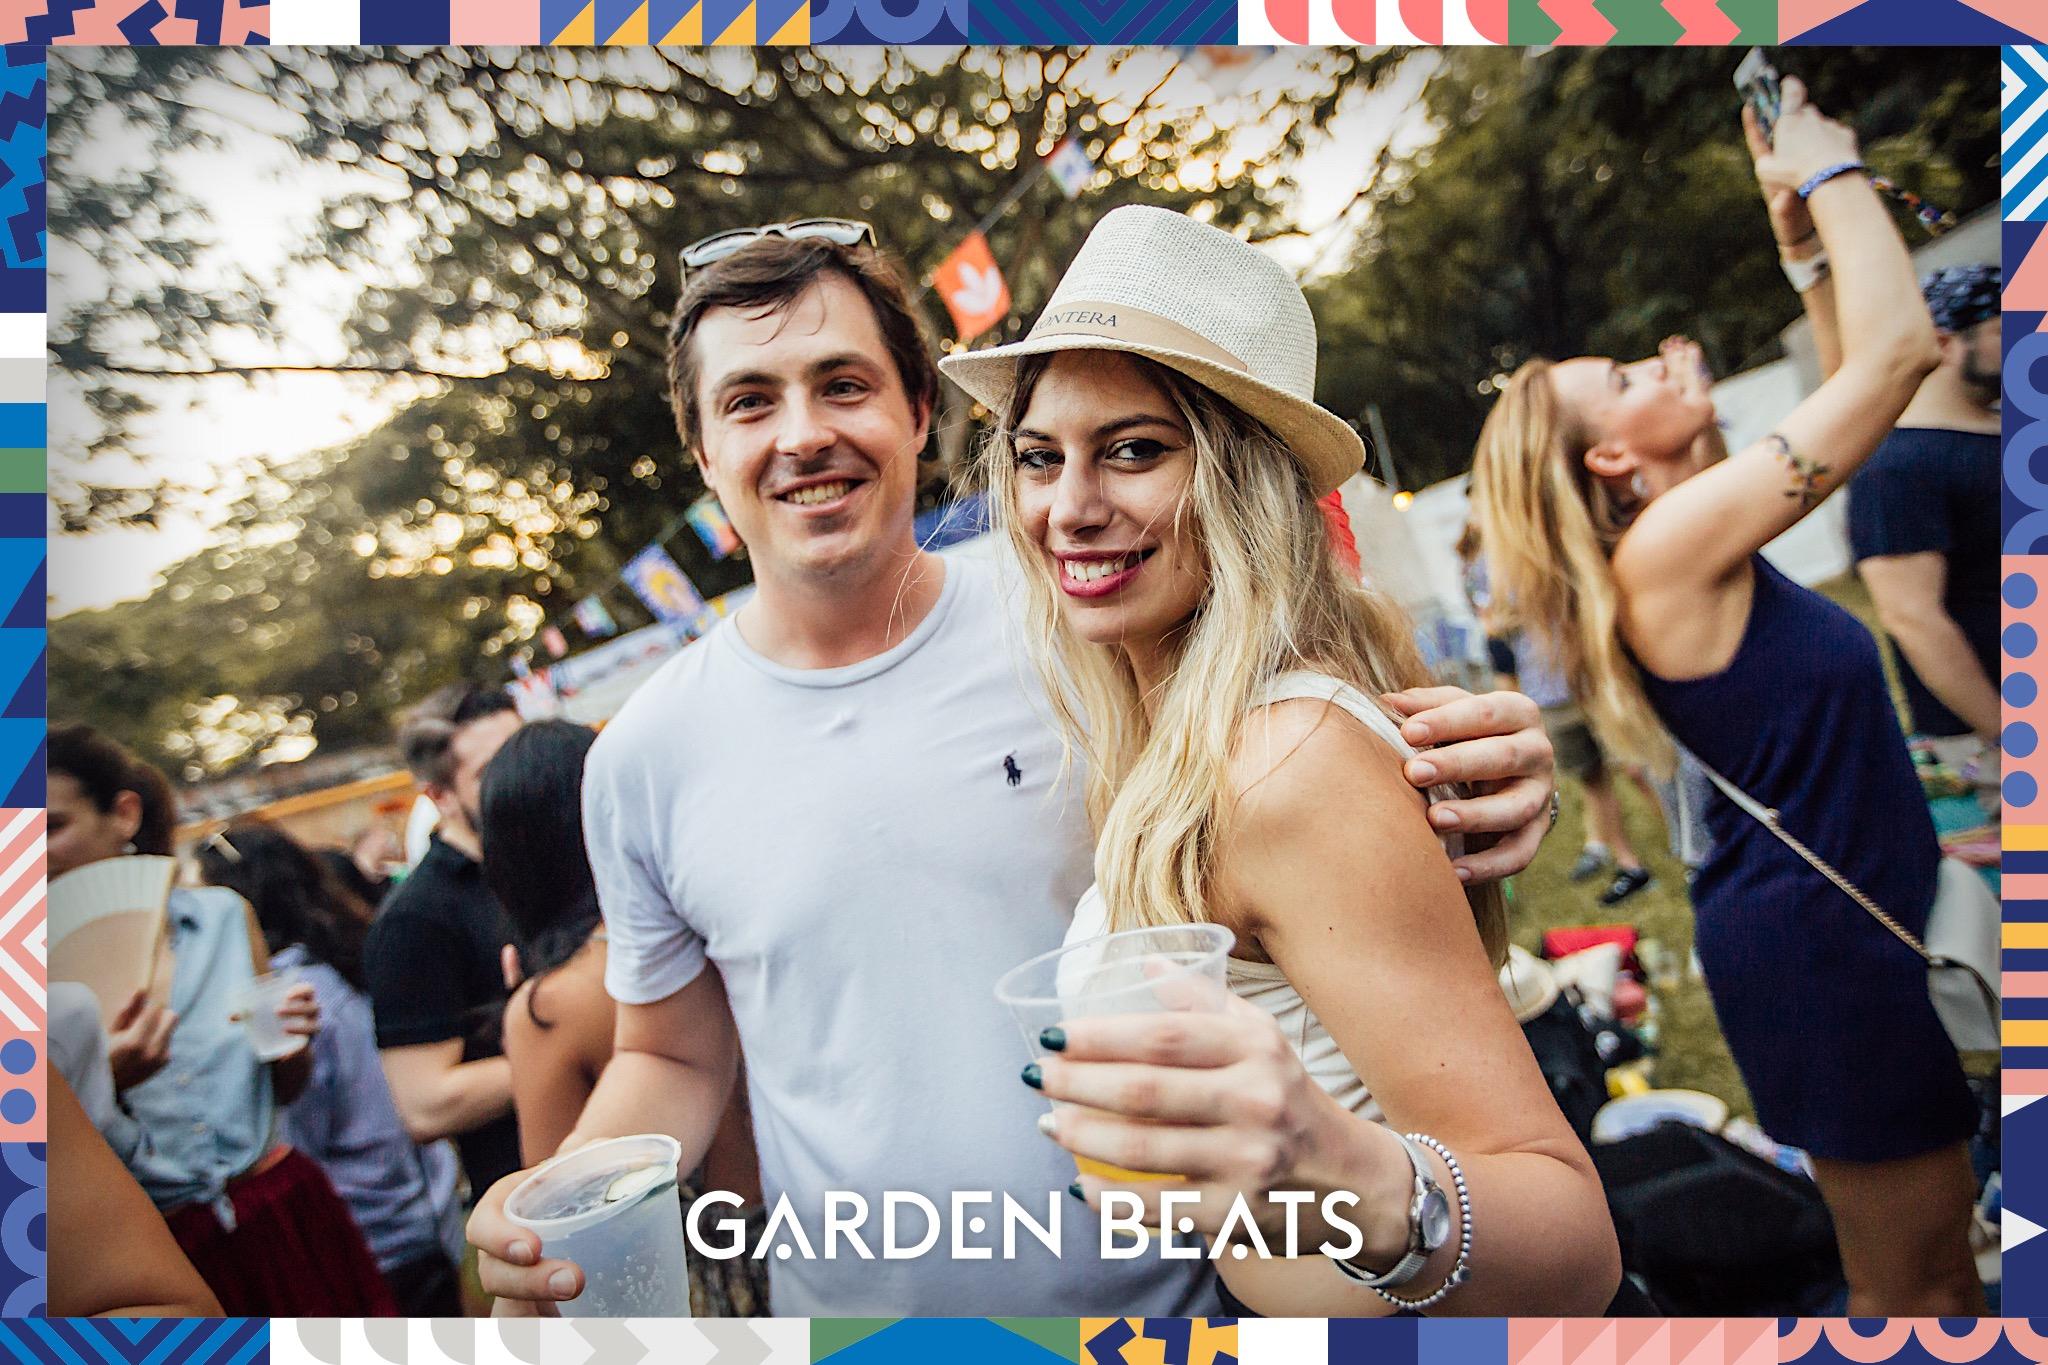 18032017_GardenBeats_Colossal673_WatermarkedGB.jpg